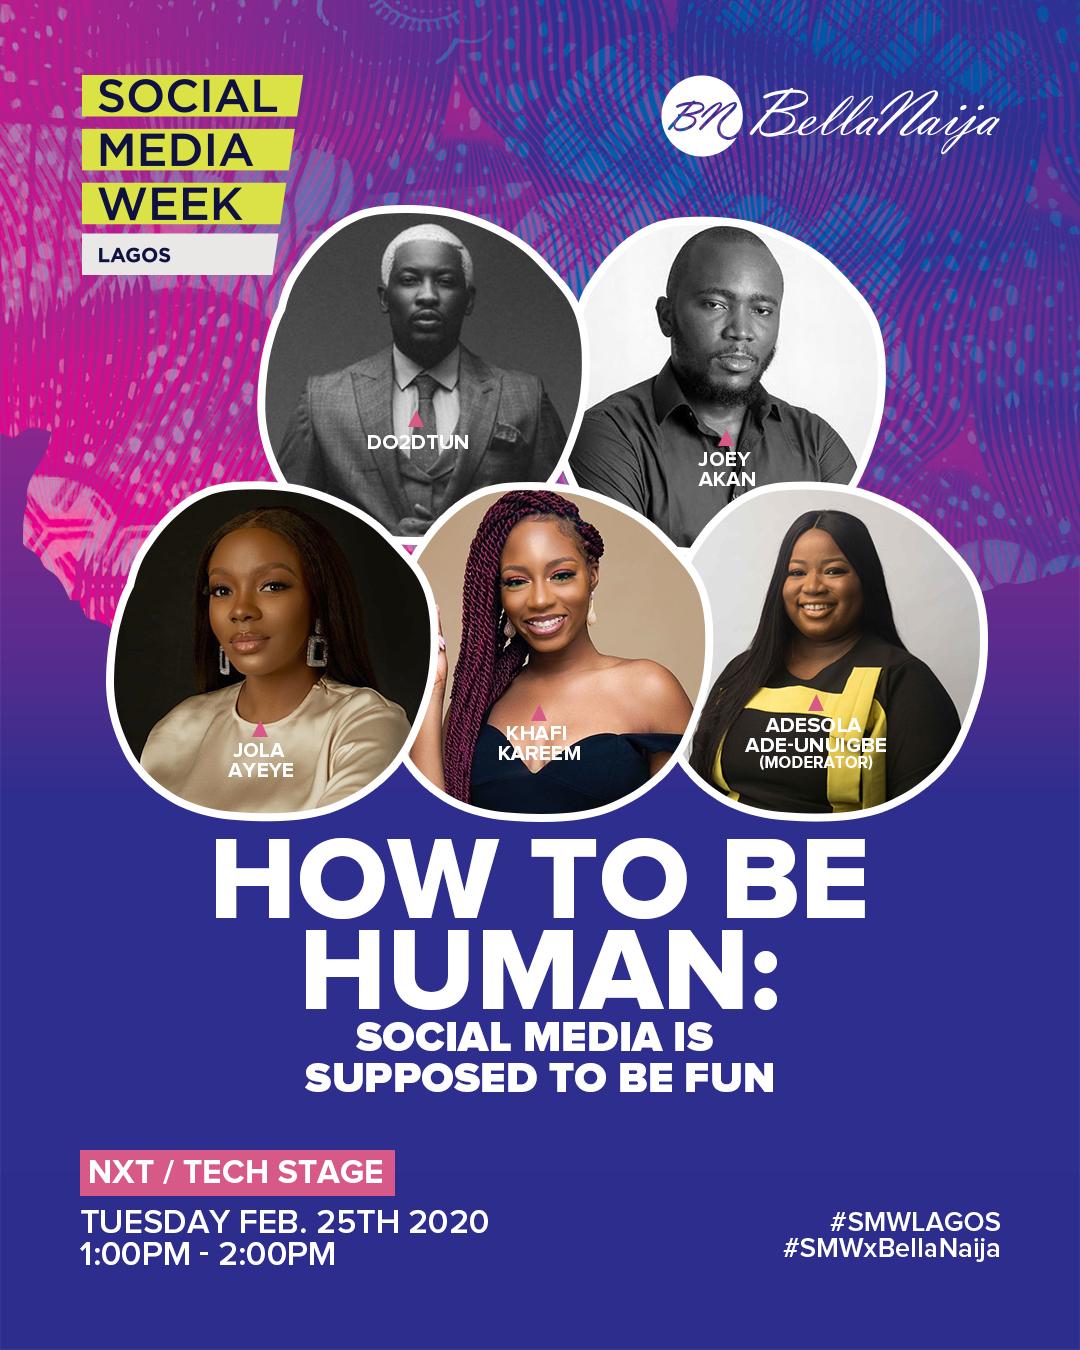 Social Media Week Lagos: Make it a Date with Adesola Ade-Unuigbe, Joey Akan, Khafi Kareem, Do2dtun, Jola Ayeye at BellaNaija's Special Panel Session